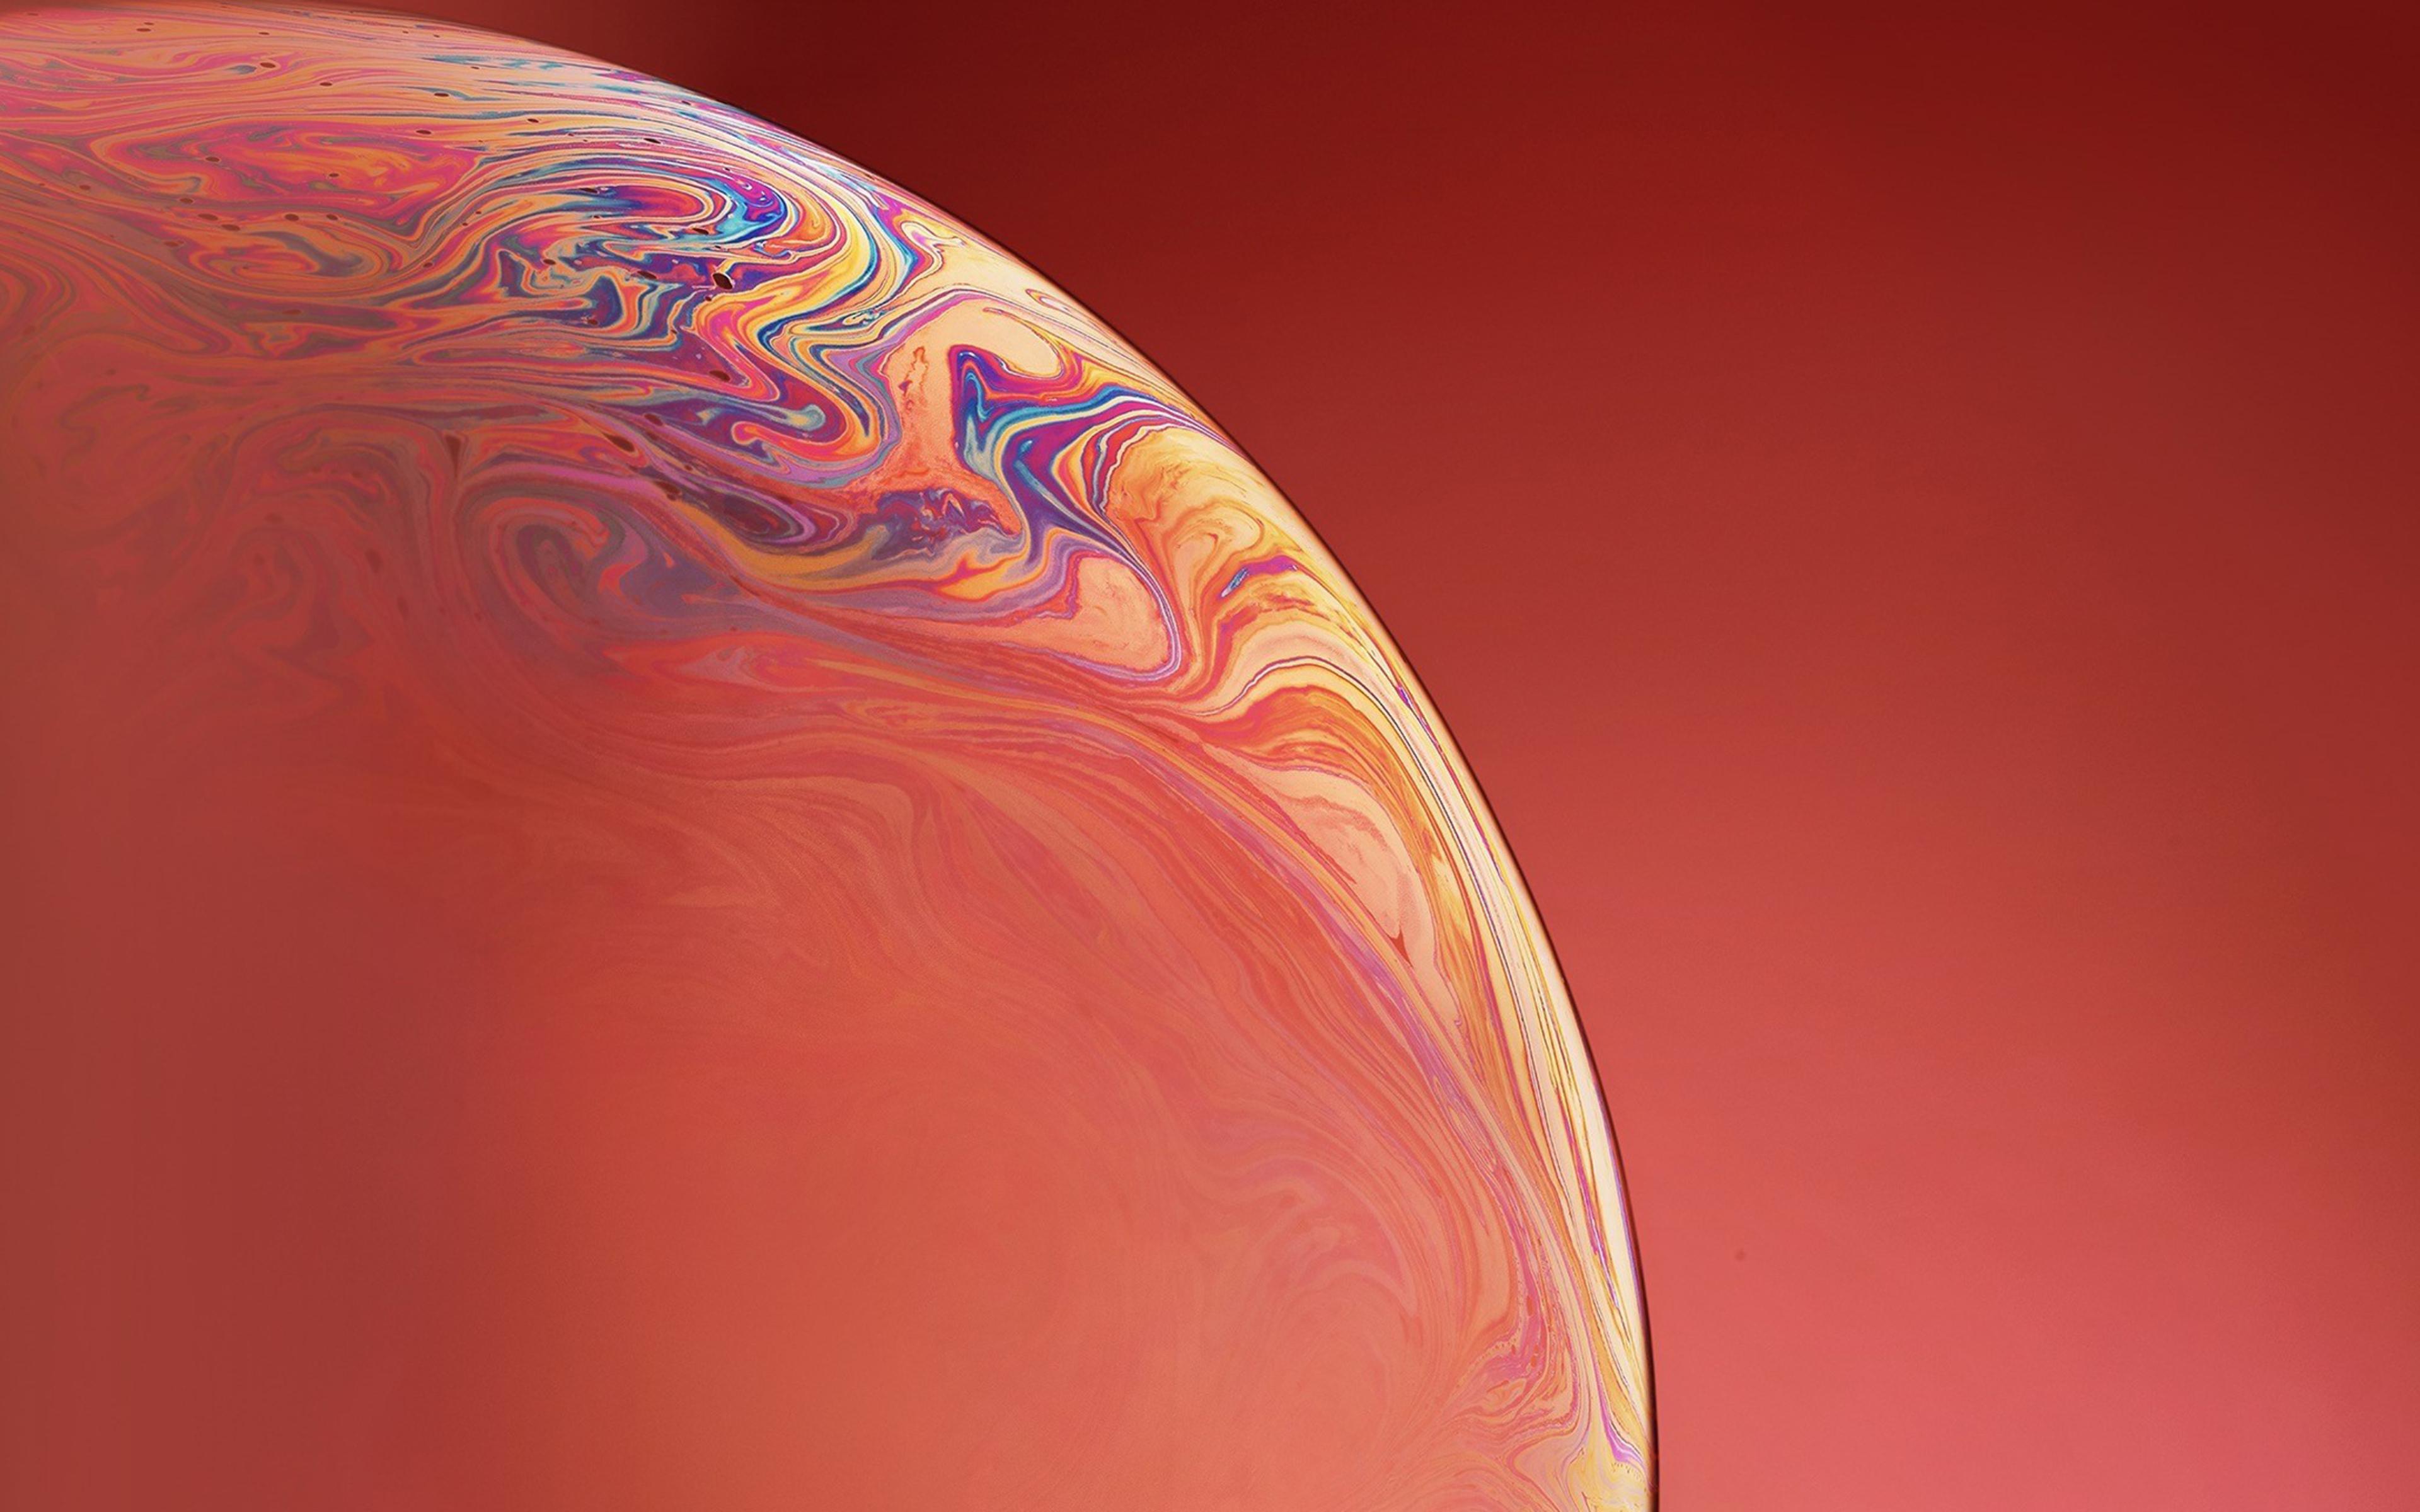 3840x2400 Iphone Xr Orange 4k HD 4k Wallpapers, Images ...